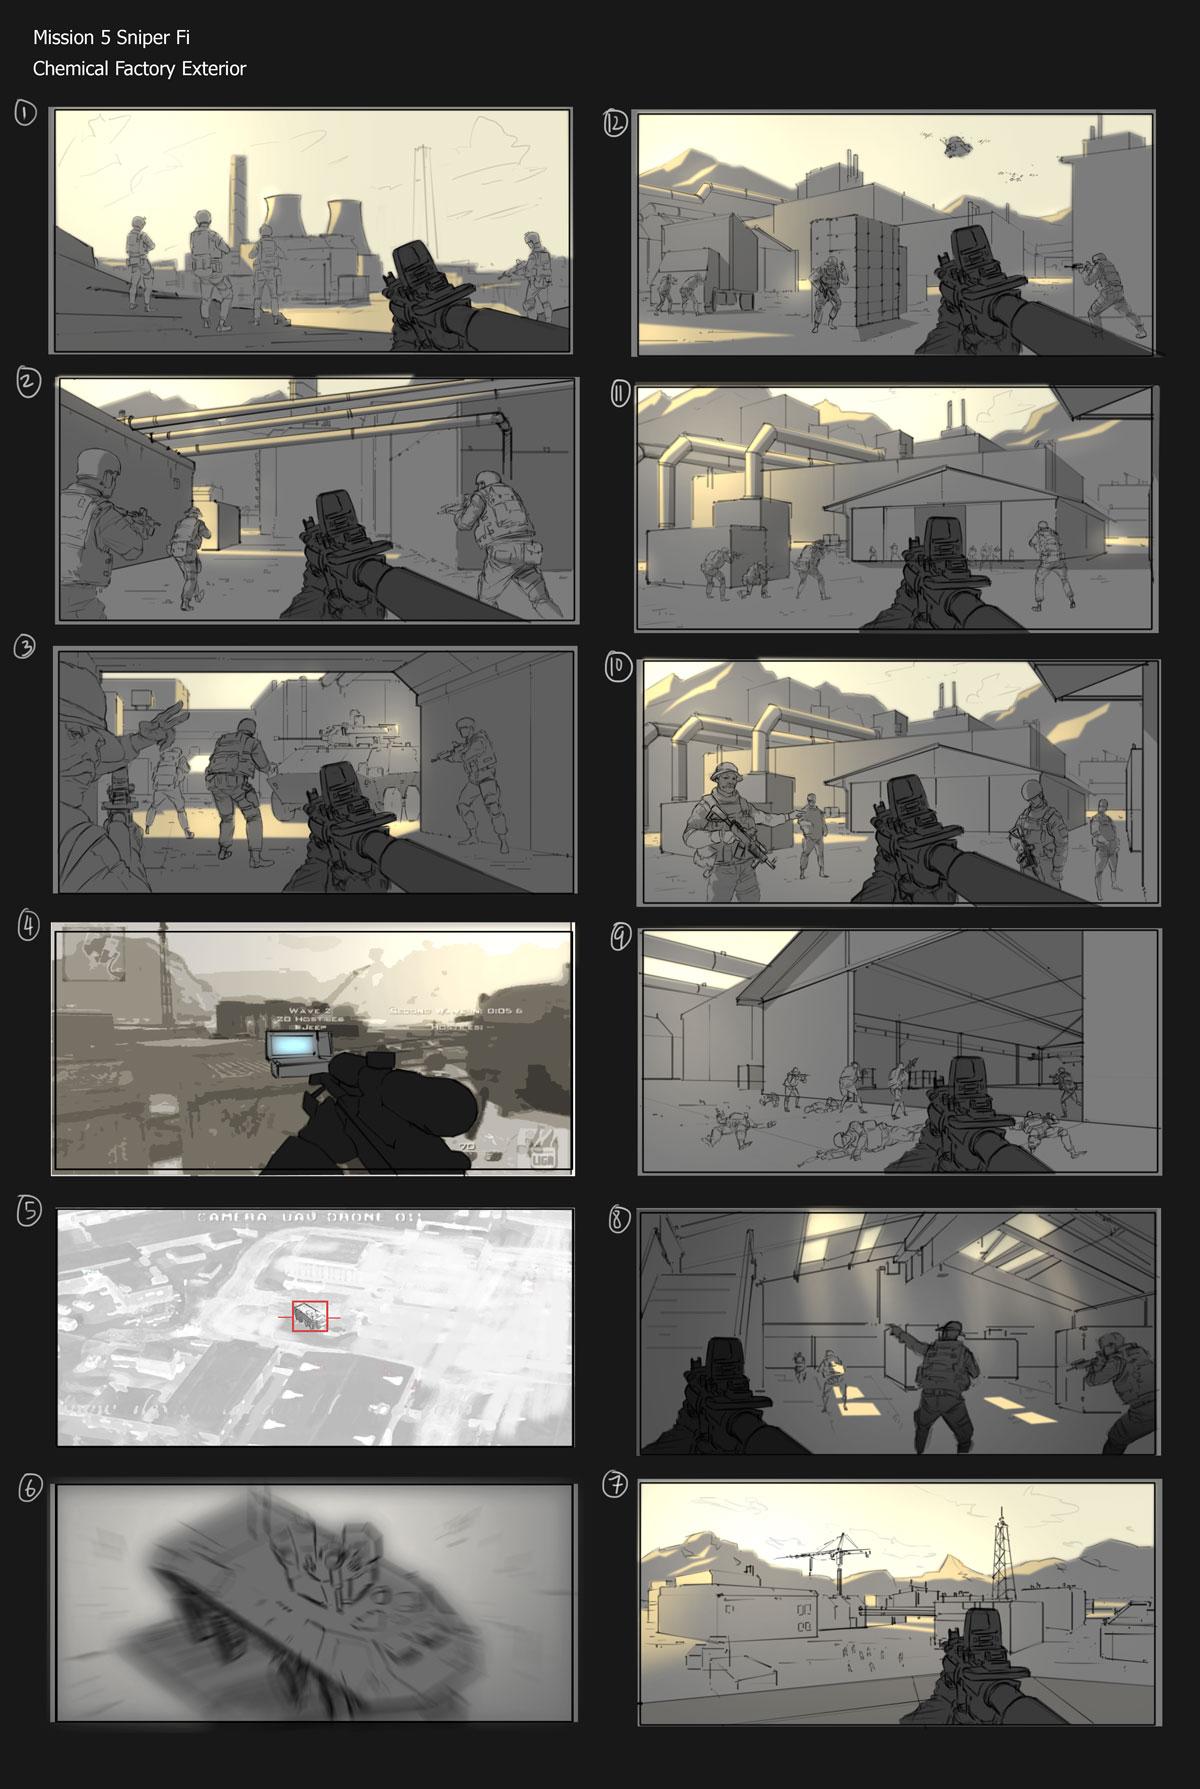 Sniper_fi_Chemical_Factory_Exterior_Storyboard.jpg